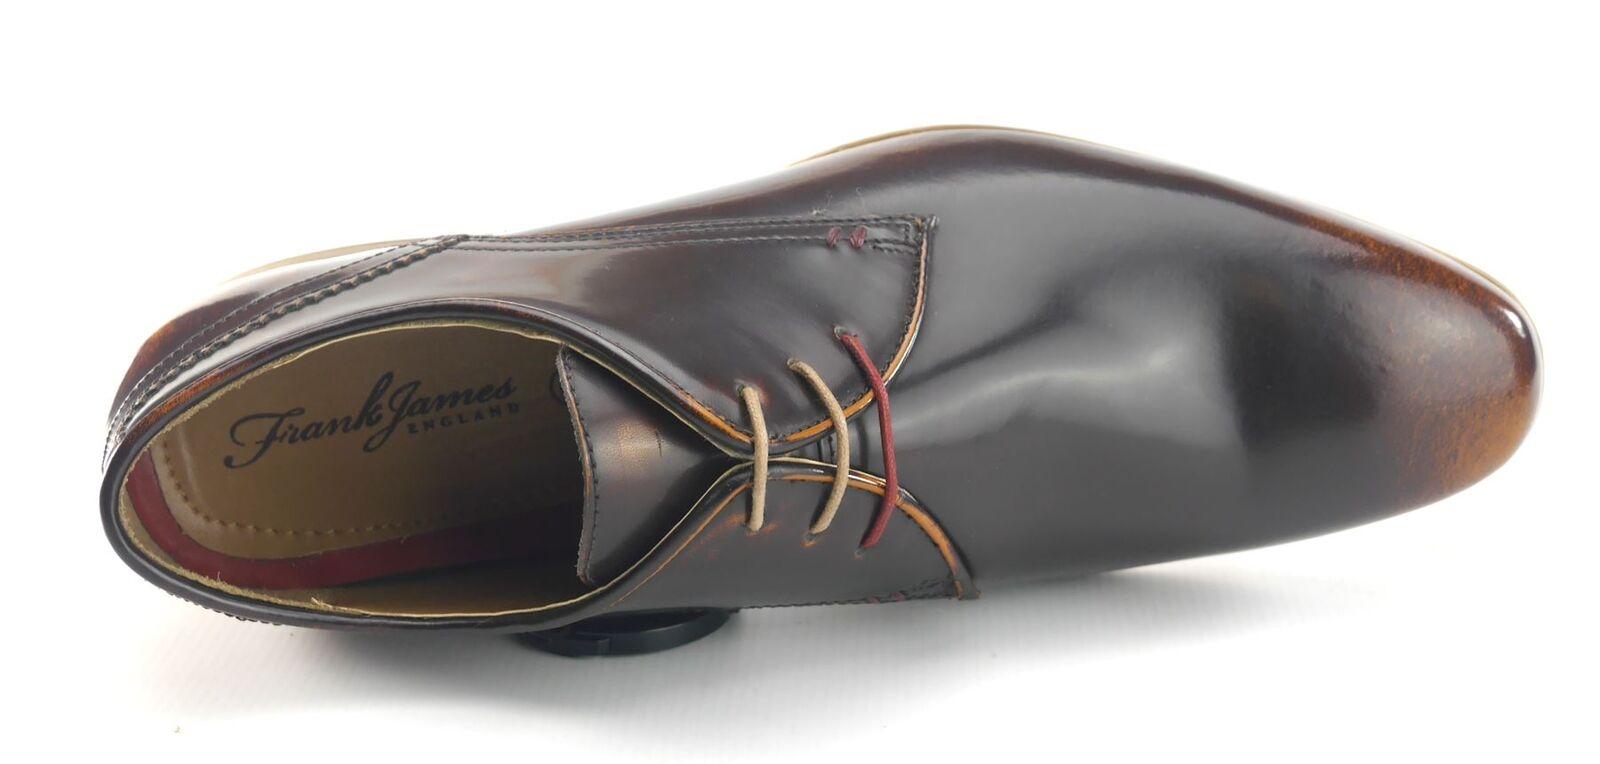 Frank James Shoreditch spitz Schuhe Herren Schnürschuhe Oxford Hochglanz Schuhe spitz braun 040401